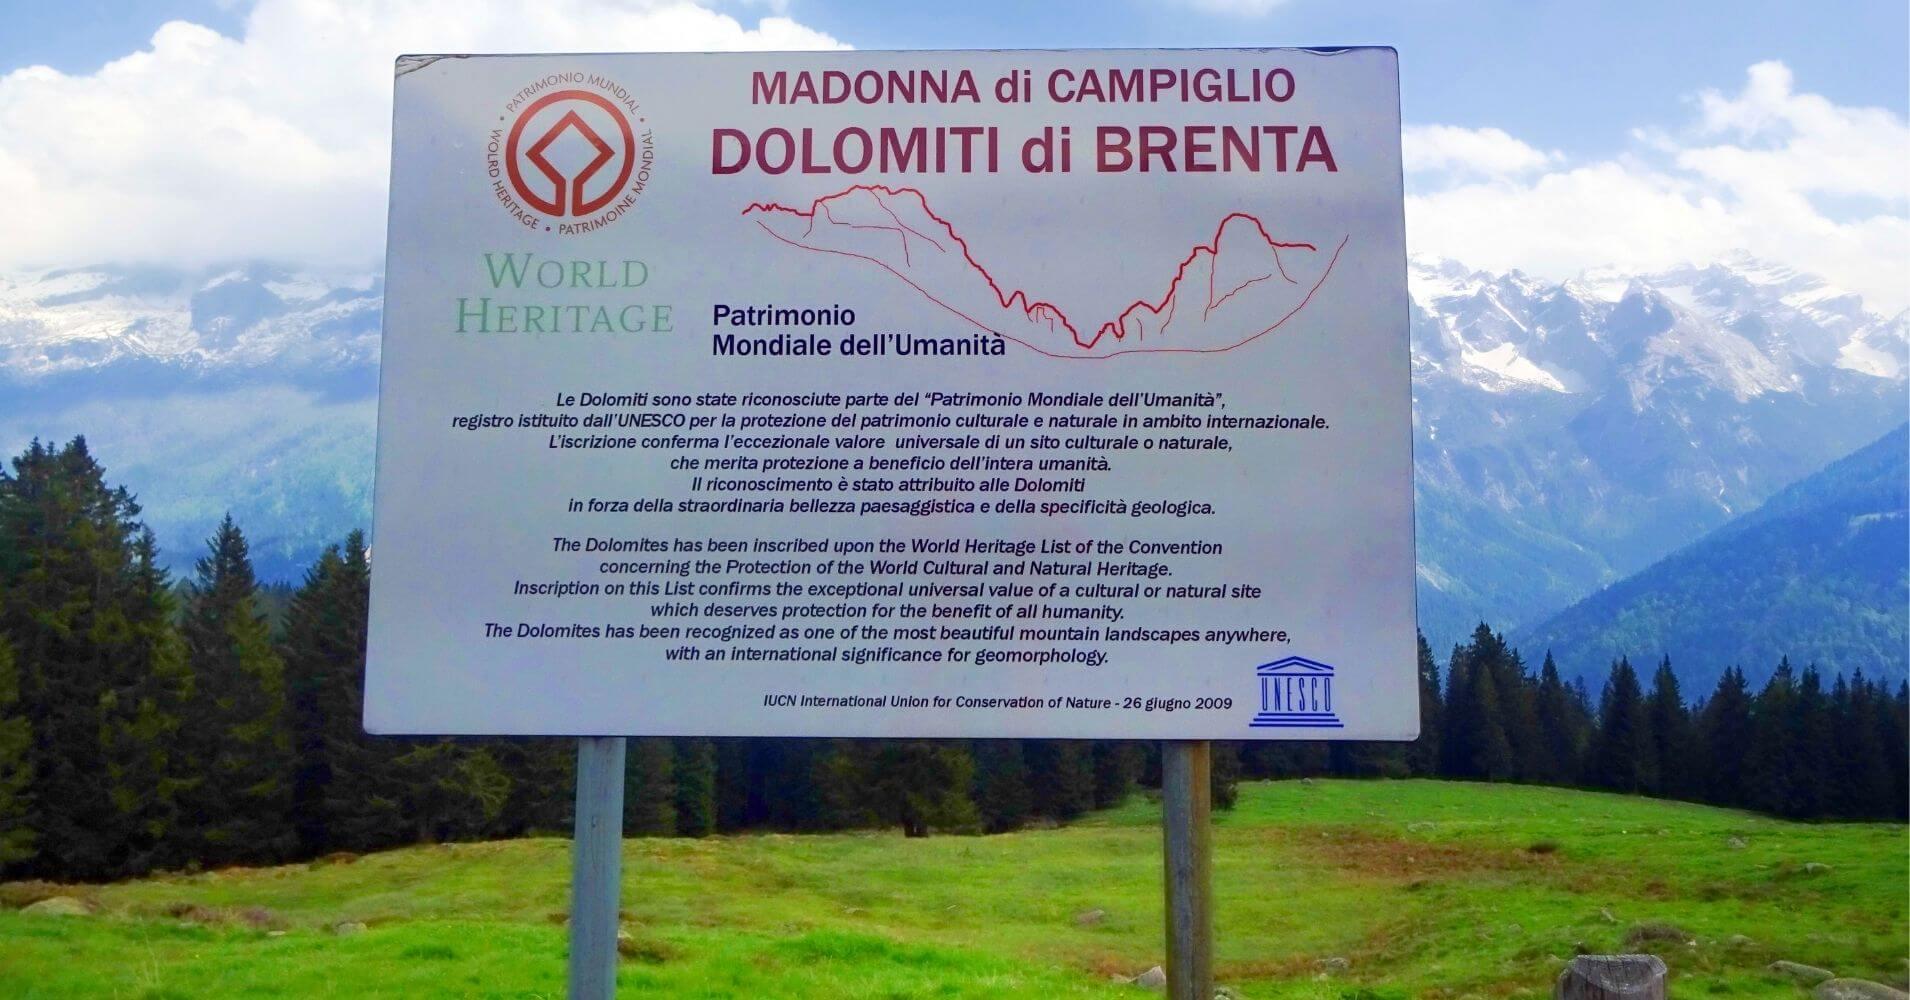 Parque Natural Adamello Brenta. Patrimonio de la Humanidad. Madona di Campiglio, Véneto. Italia.